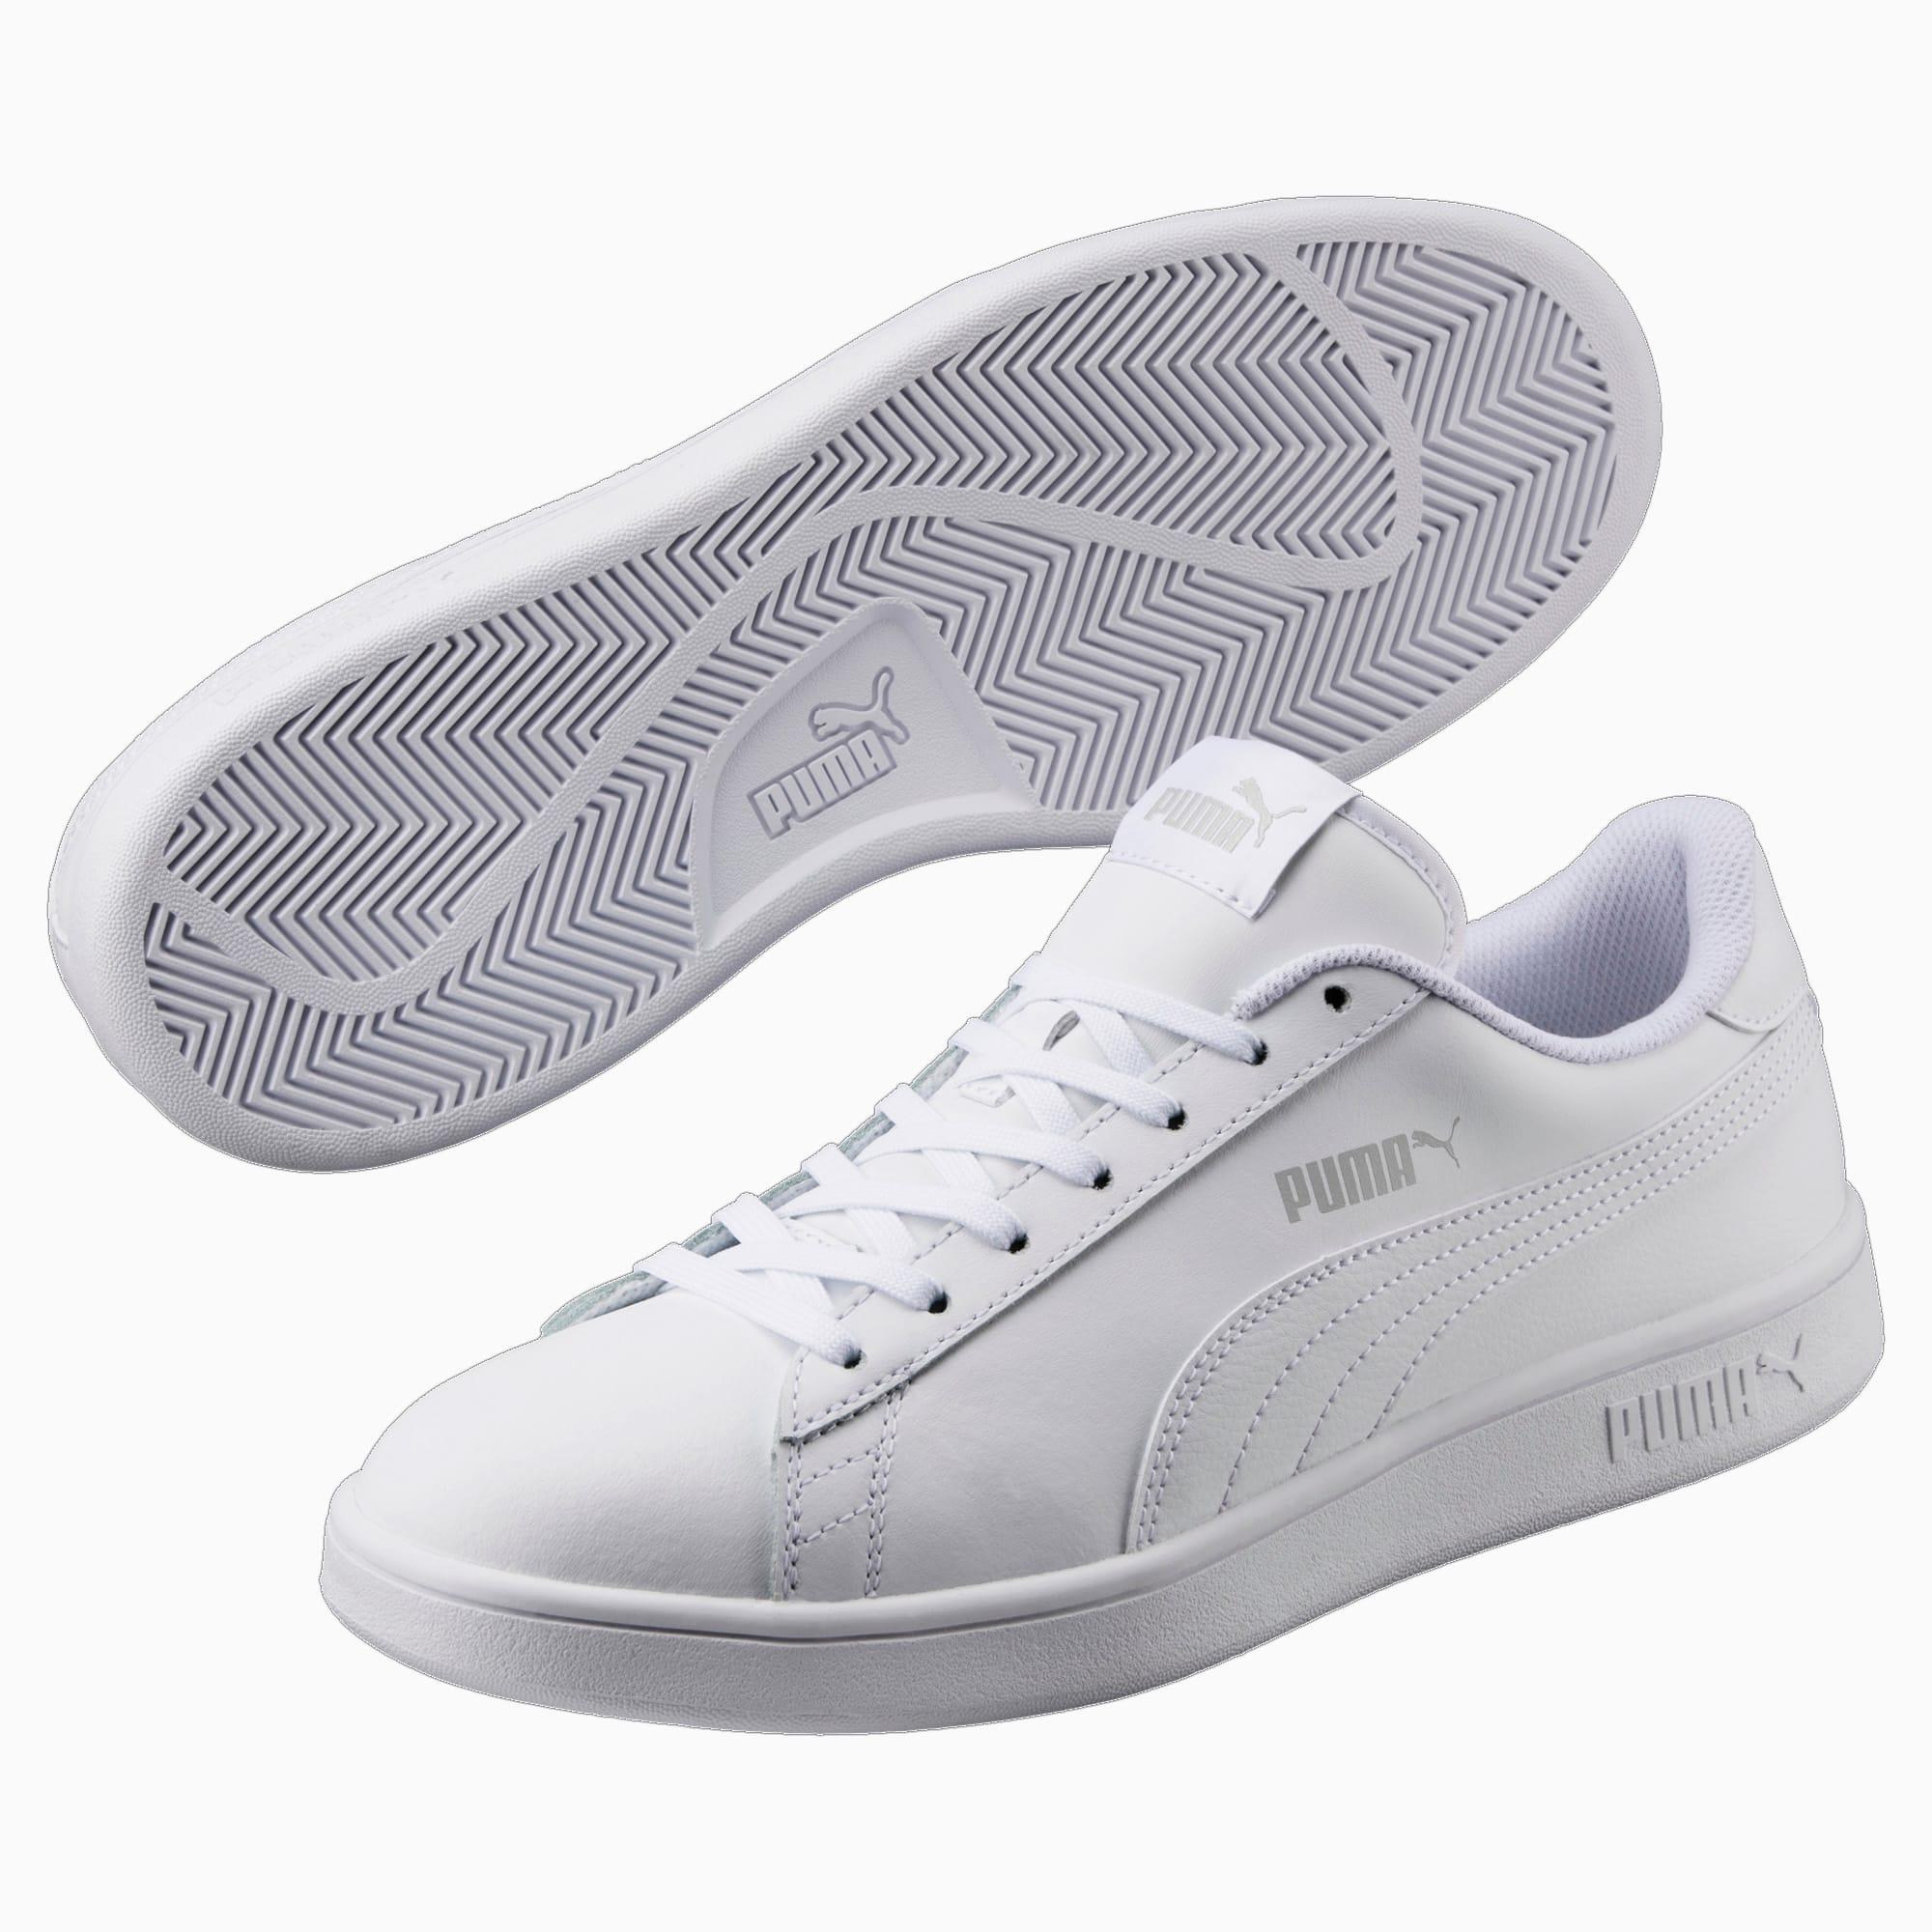 PUMA Smash v2 Men's Sneakers